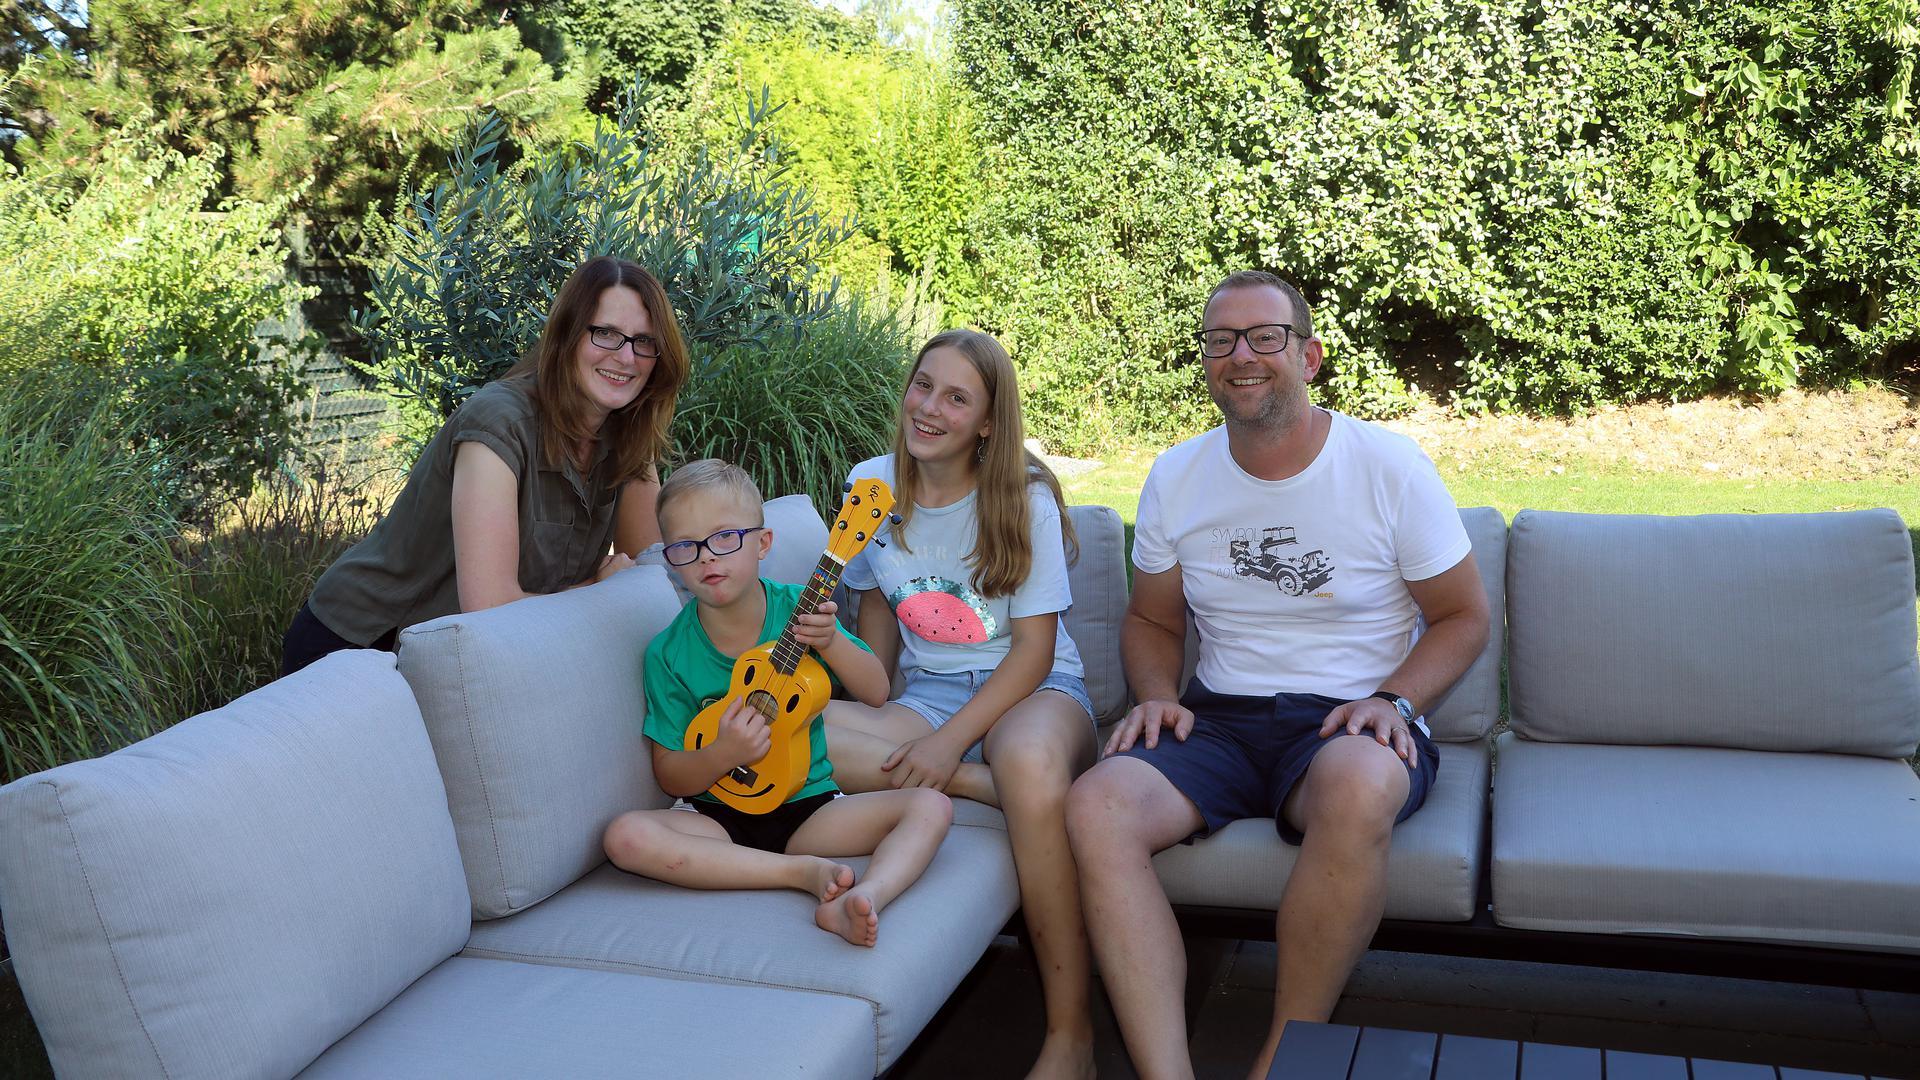 In Palmbach lebt Familie Zerbe: Mutter Susanne , Vater Clemens, Sohn Maximilian (mit Trisomie 21), Tochter Johanna. Aufnahme vom 20.08.2020